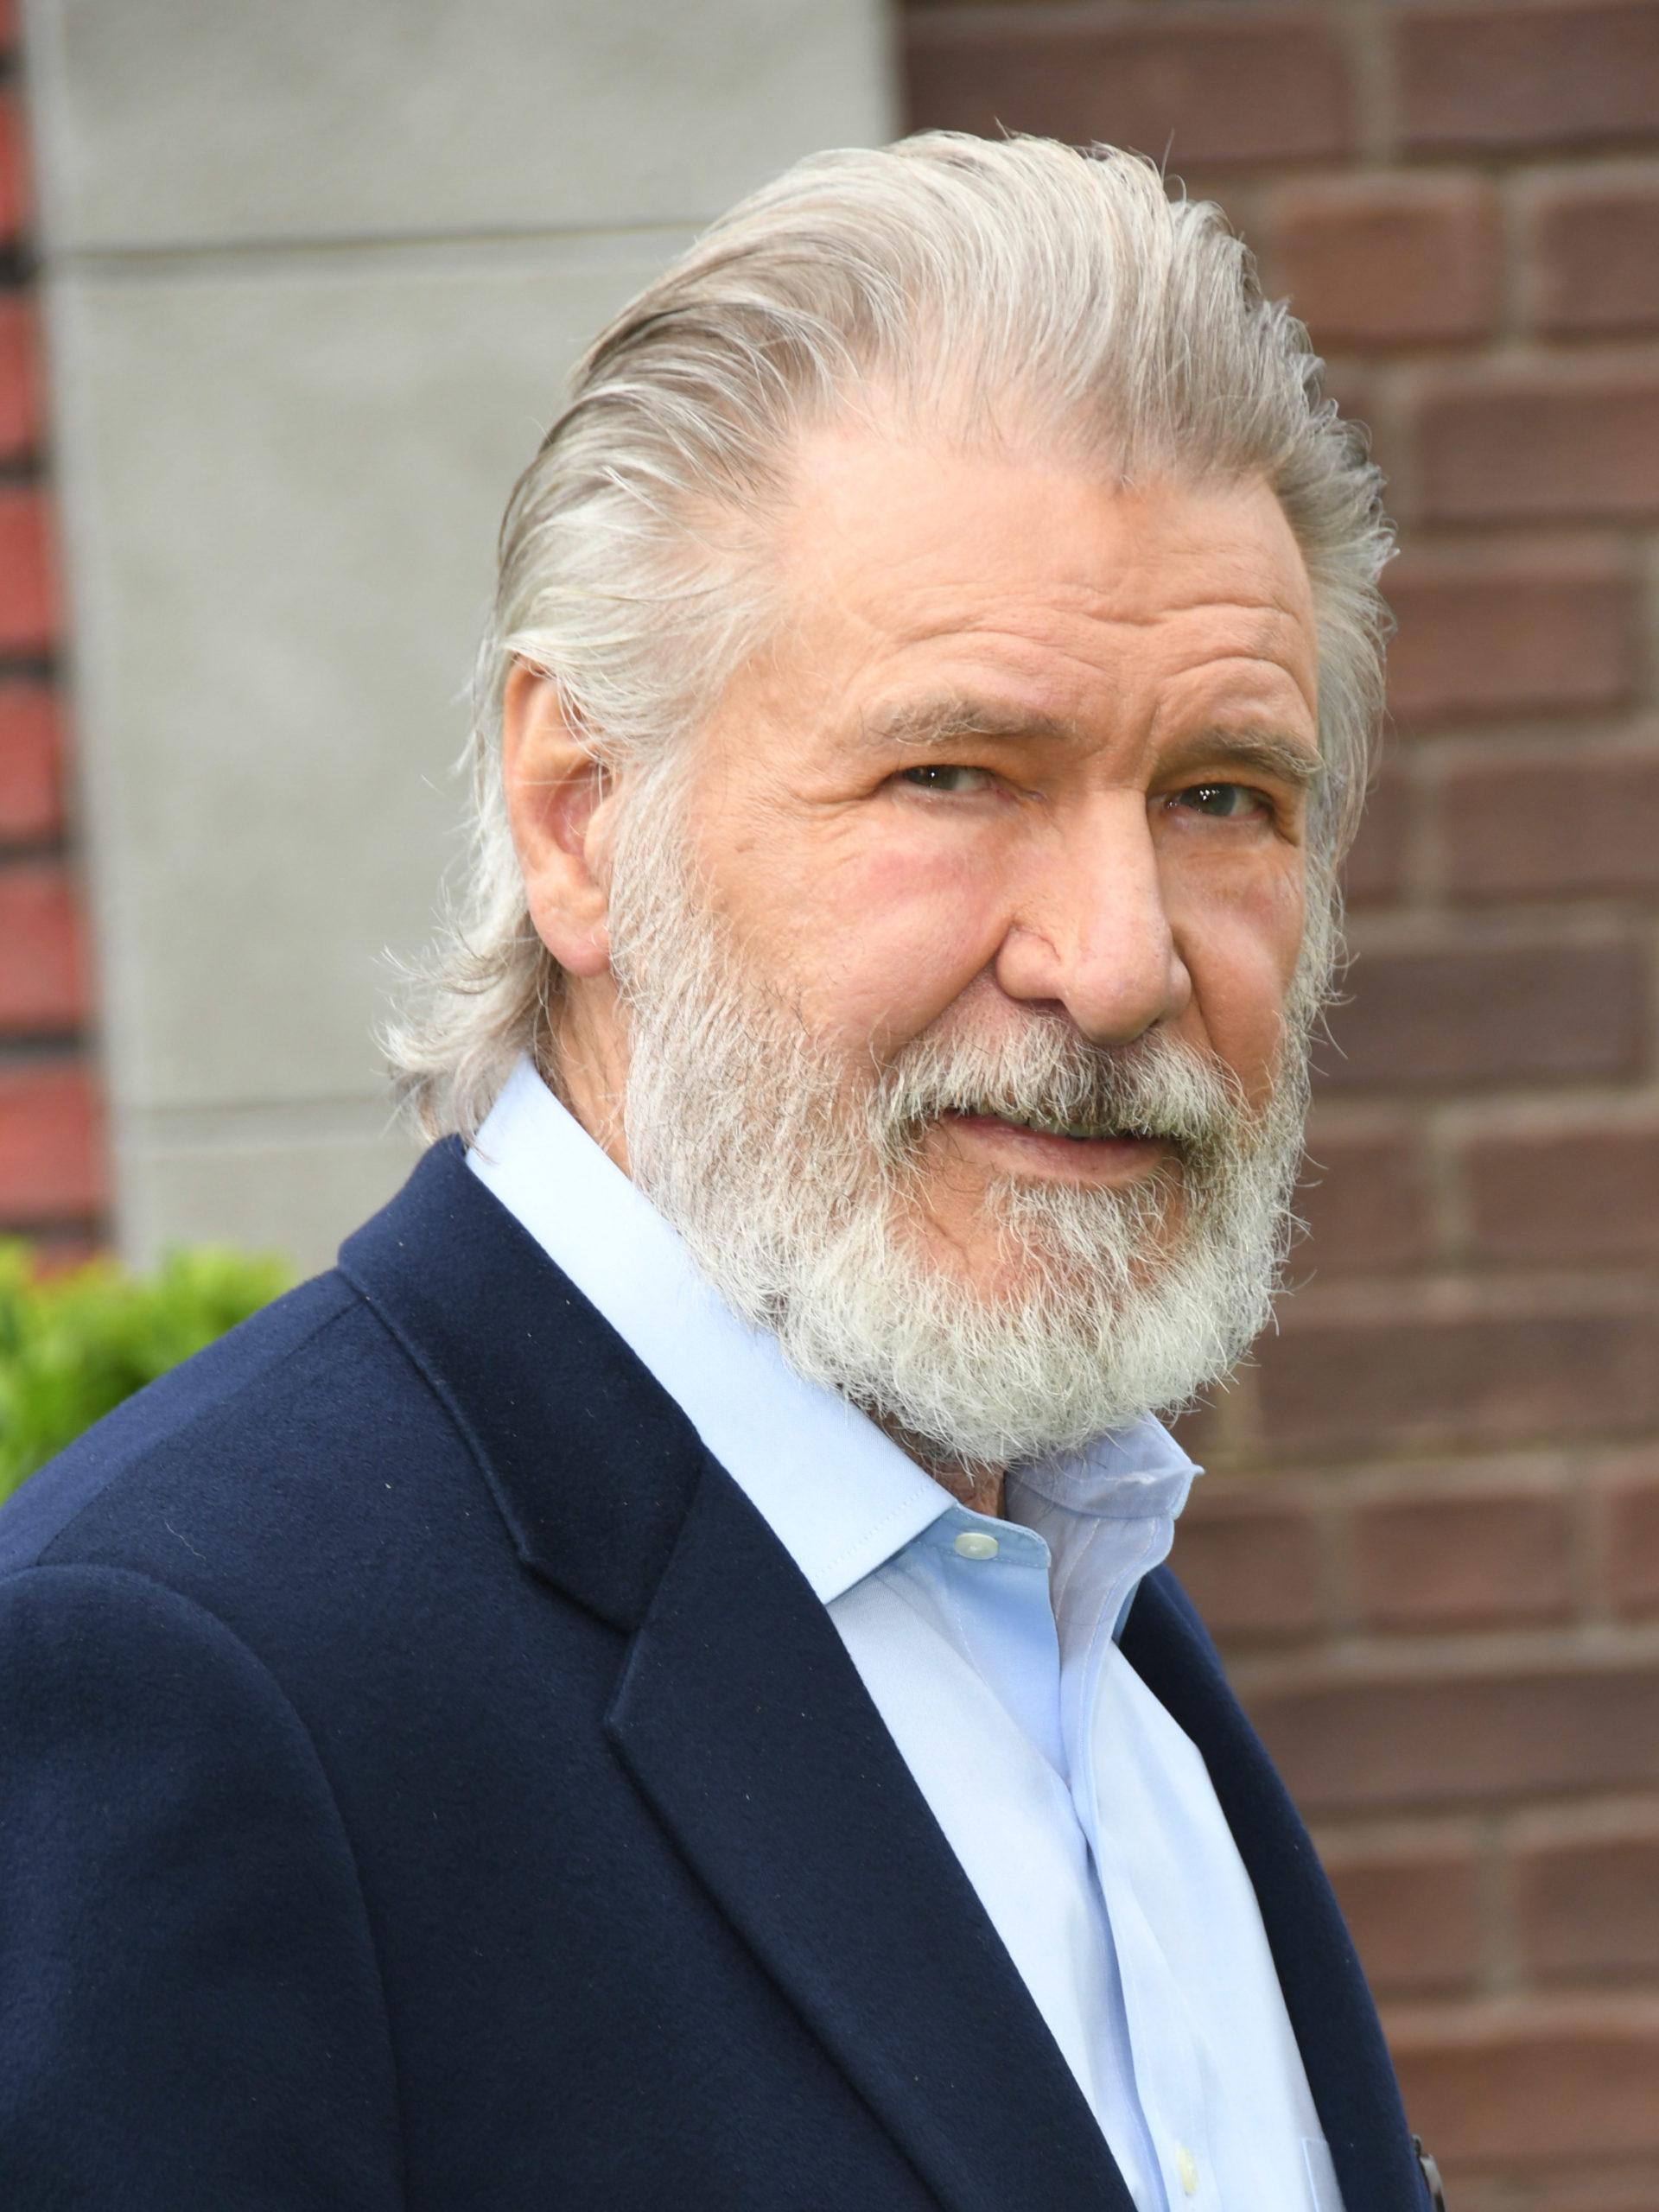 Harrison Ford Indiana Jones Franchise Rumored Successor Revealed!